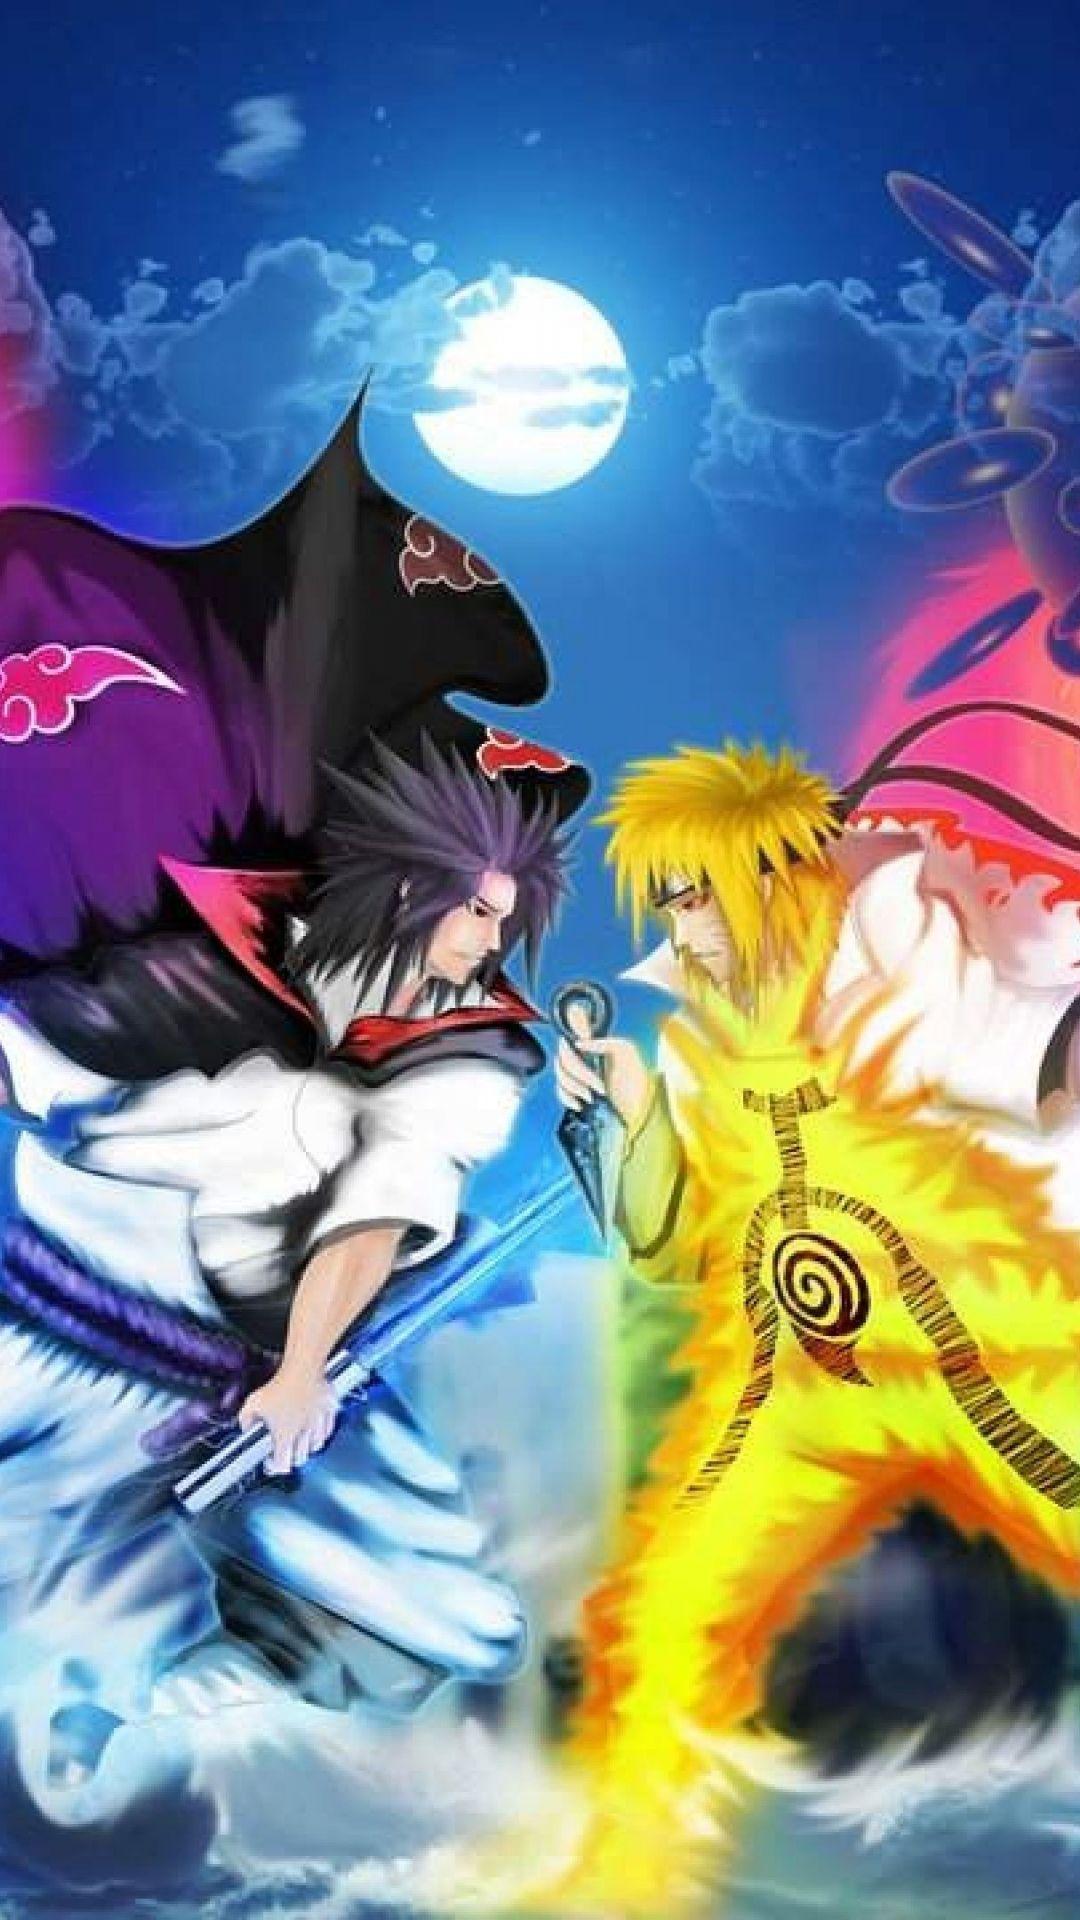 1276x708 hd naruto shippuden ultimate ninja storm 4 wallpaper. Aesthetic Naruto 4k Wallpapers - Wallpaper Cave